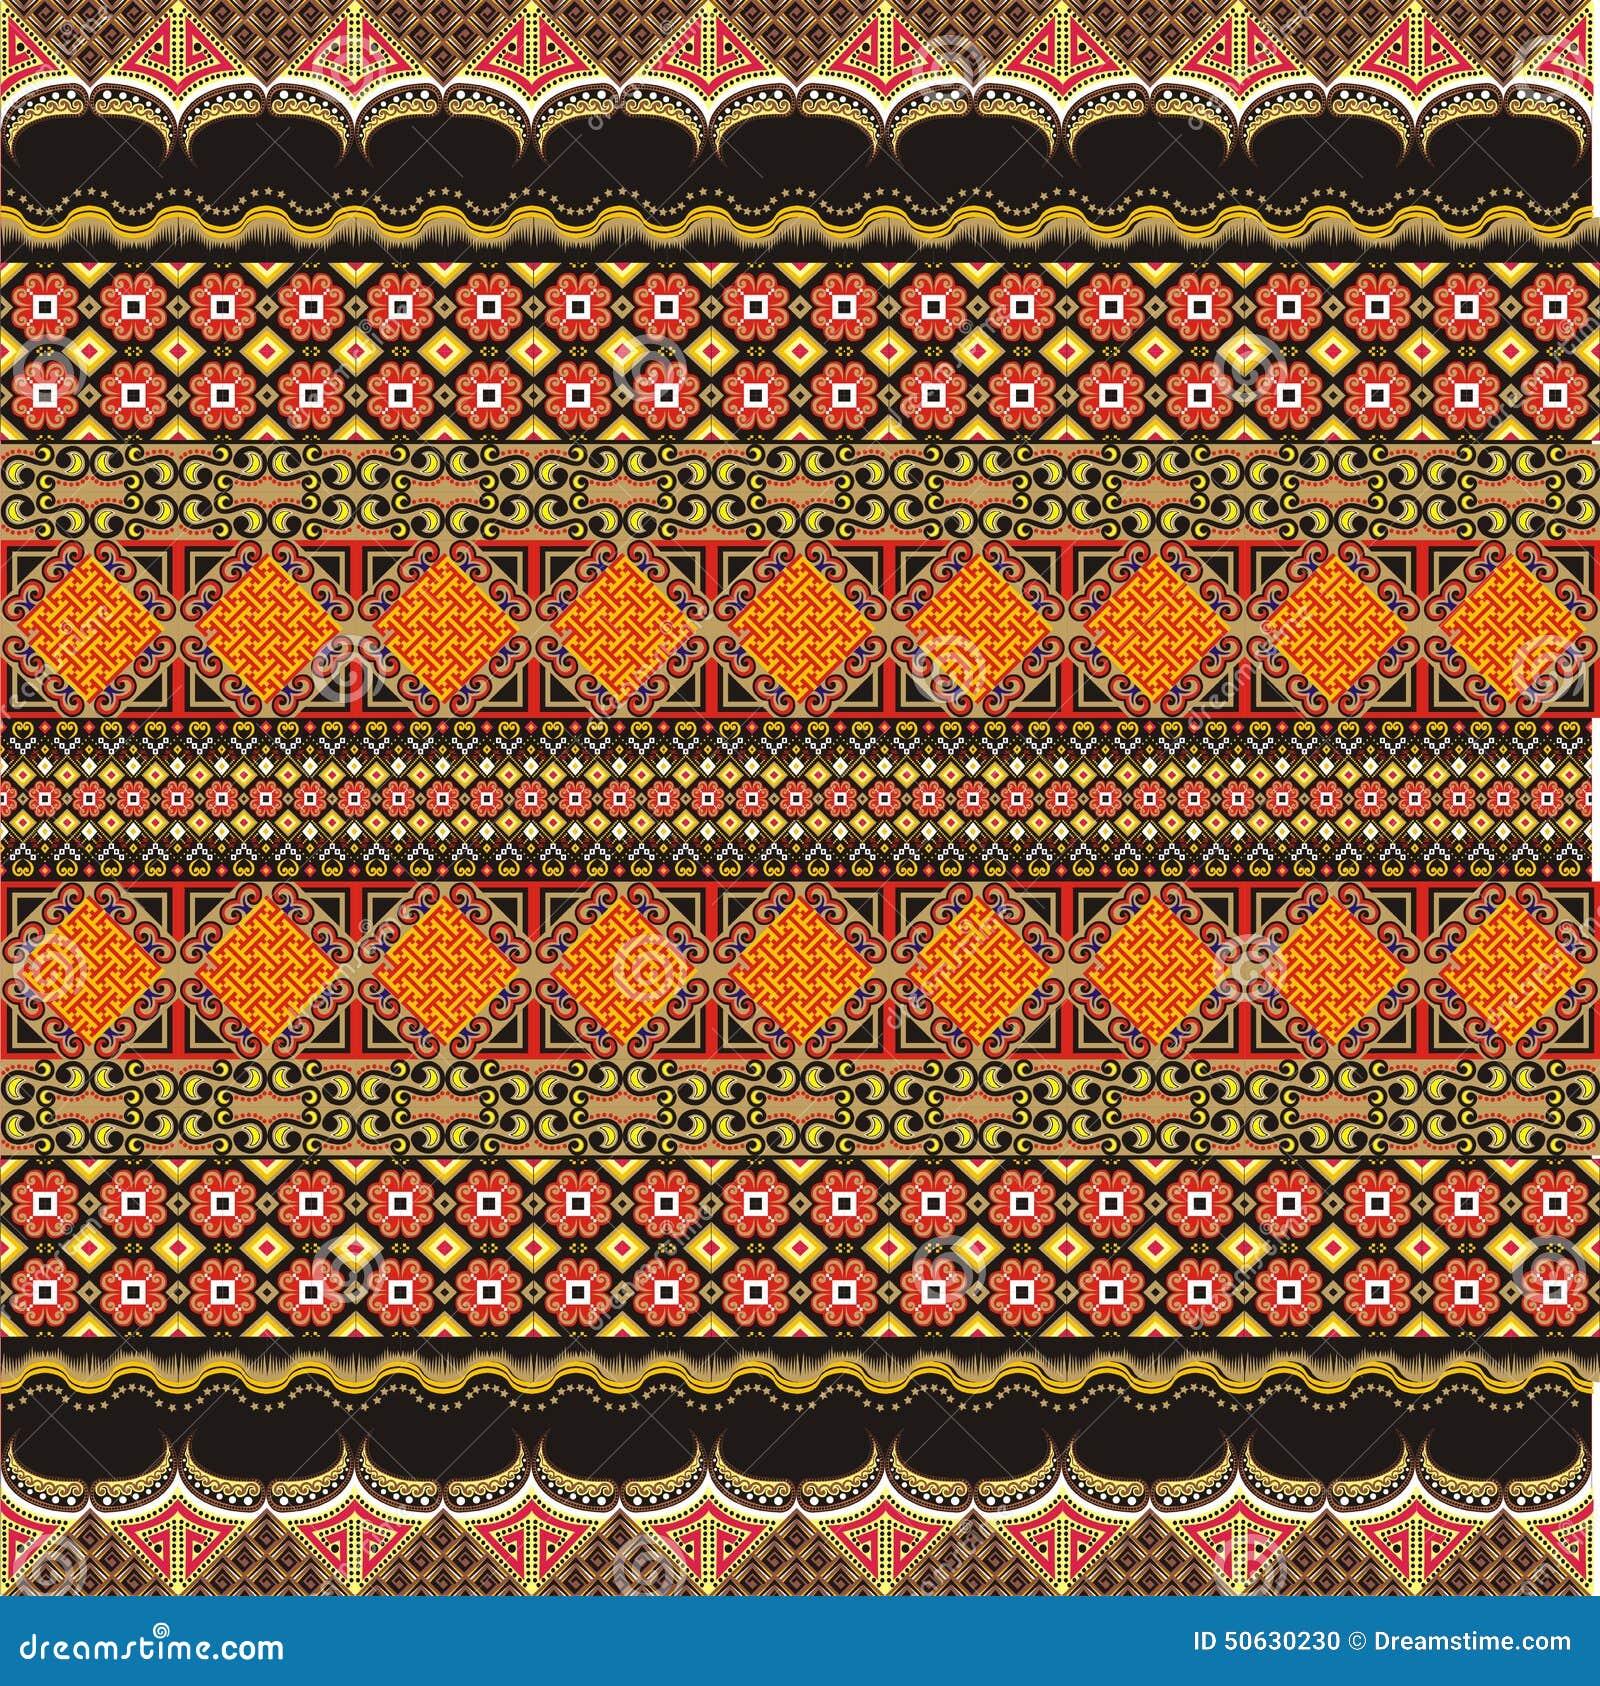 Modern Batik Motif Decoration Stock Illustration - Image: 50630230